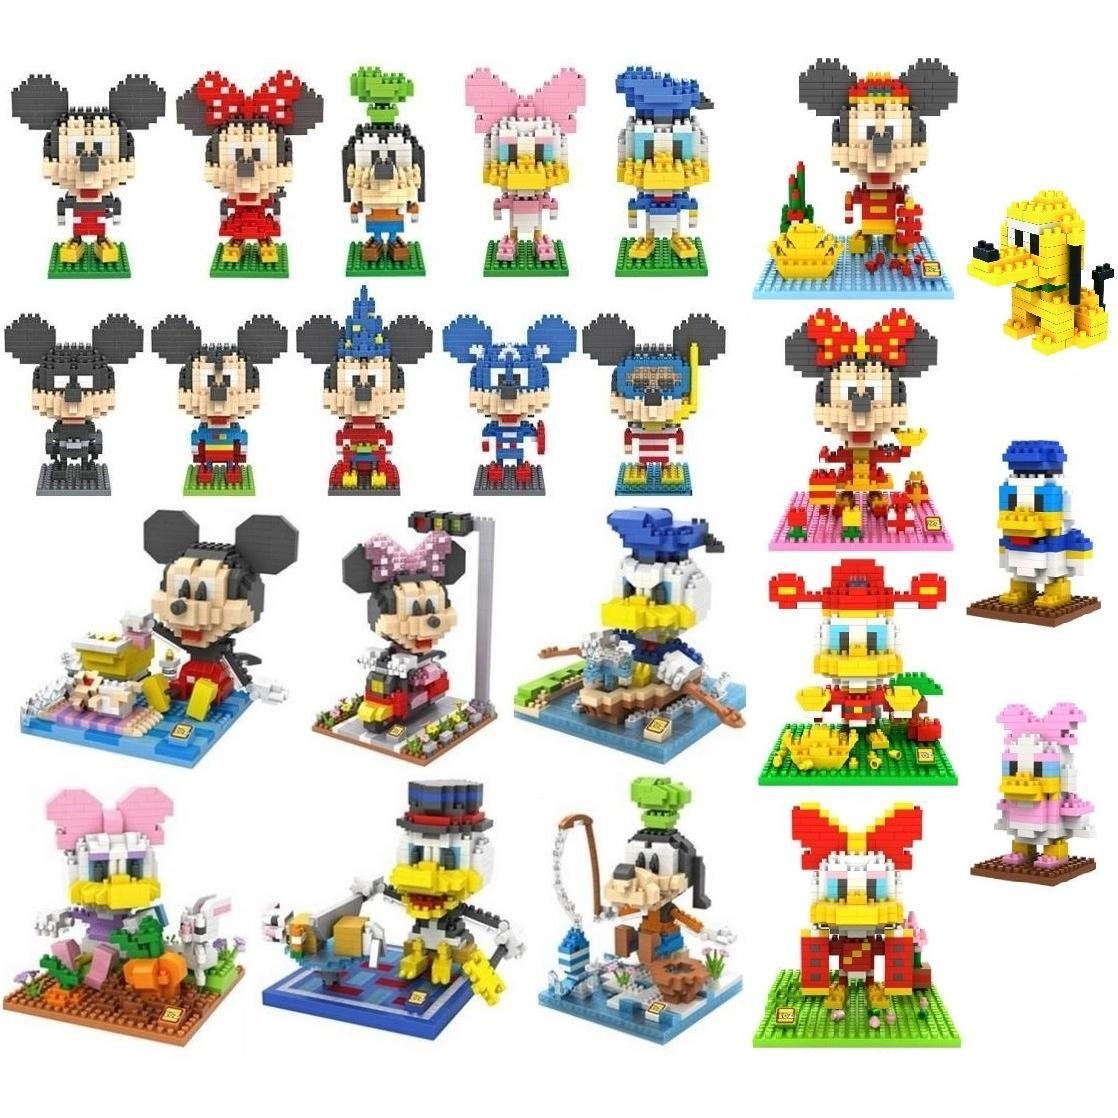 Disney building blocks clipart banner library download Disney Mickey/Donald Duck/Goofy/Pluto/Etc Loz Diamond Building ... banner library download